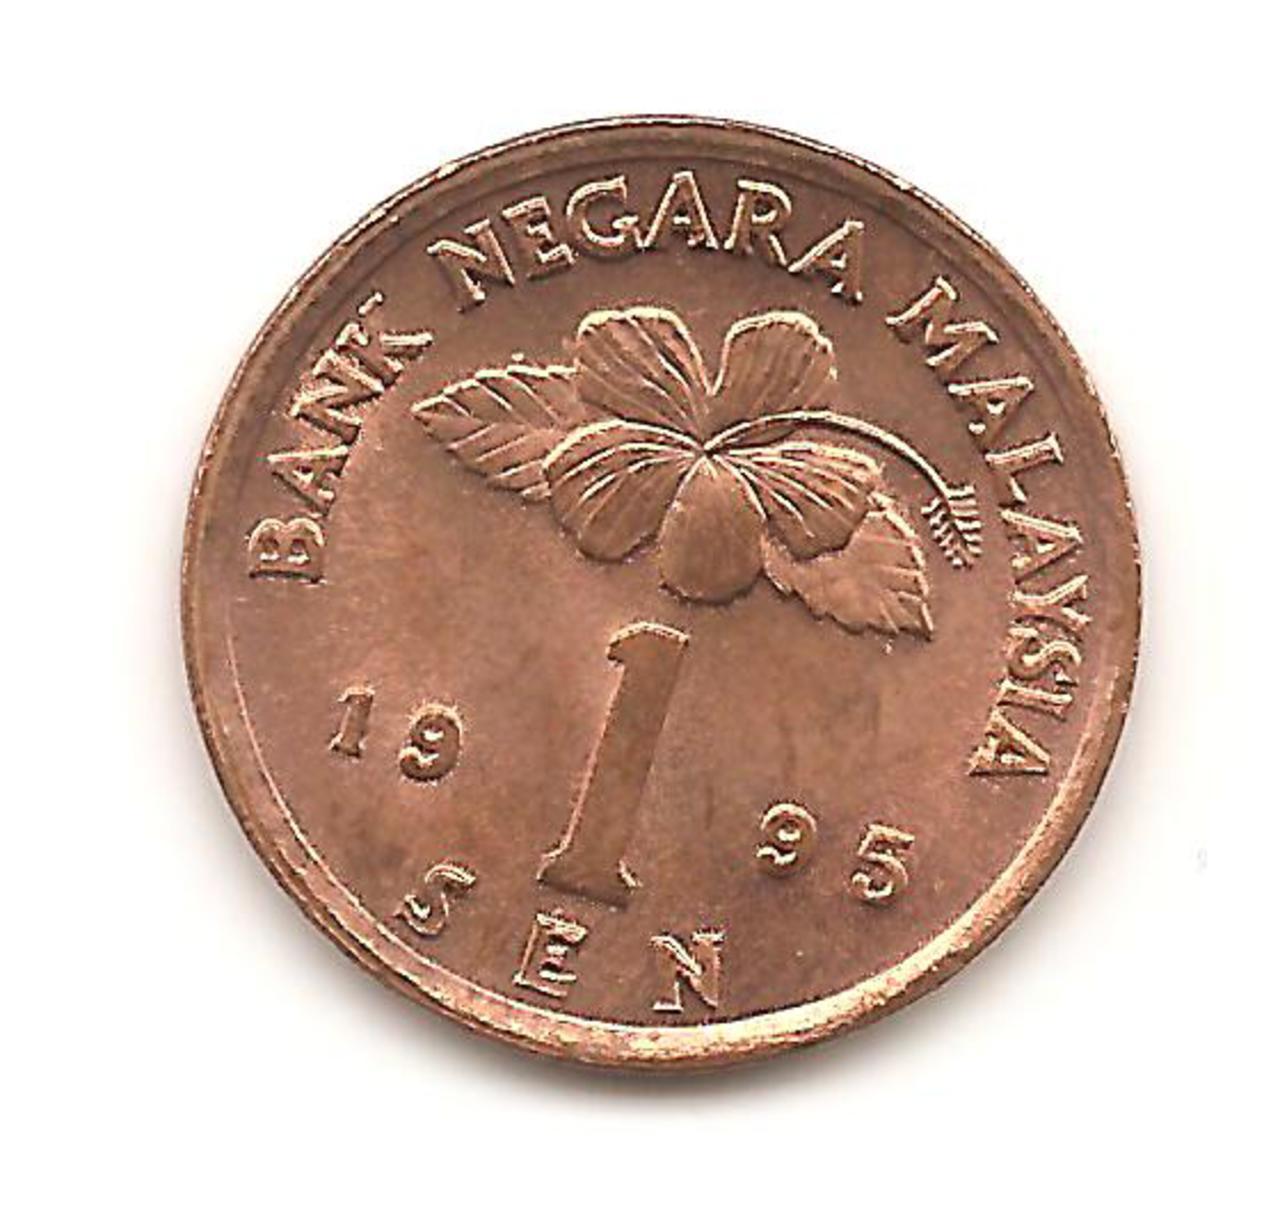 1 sen de 1995  Malasia Image